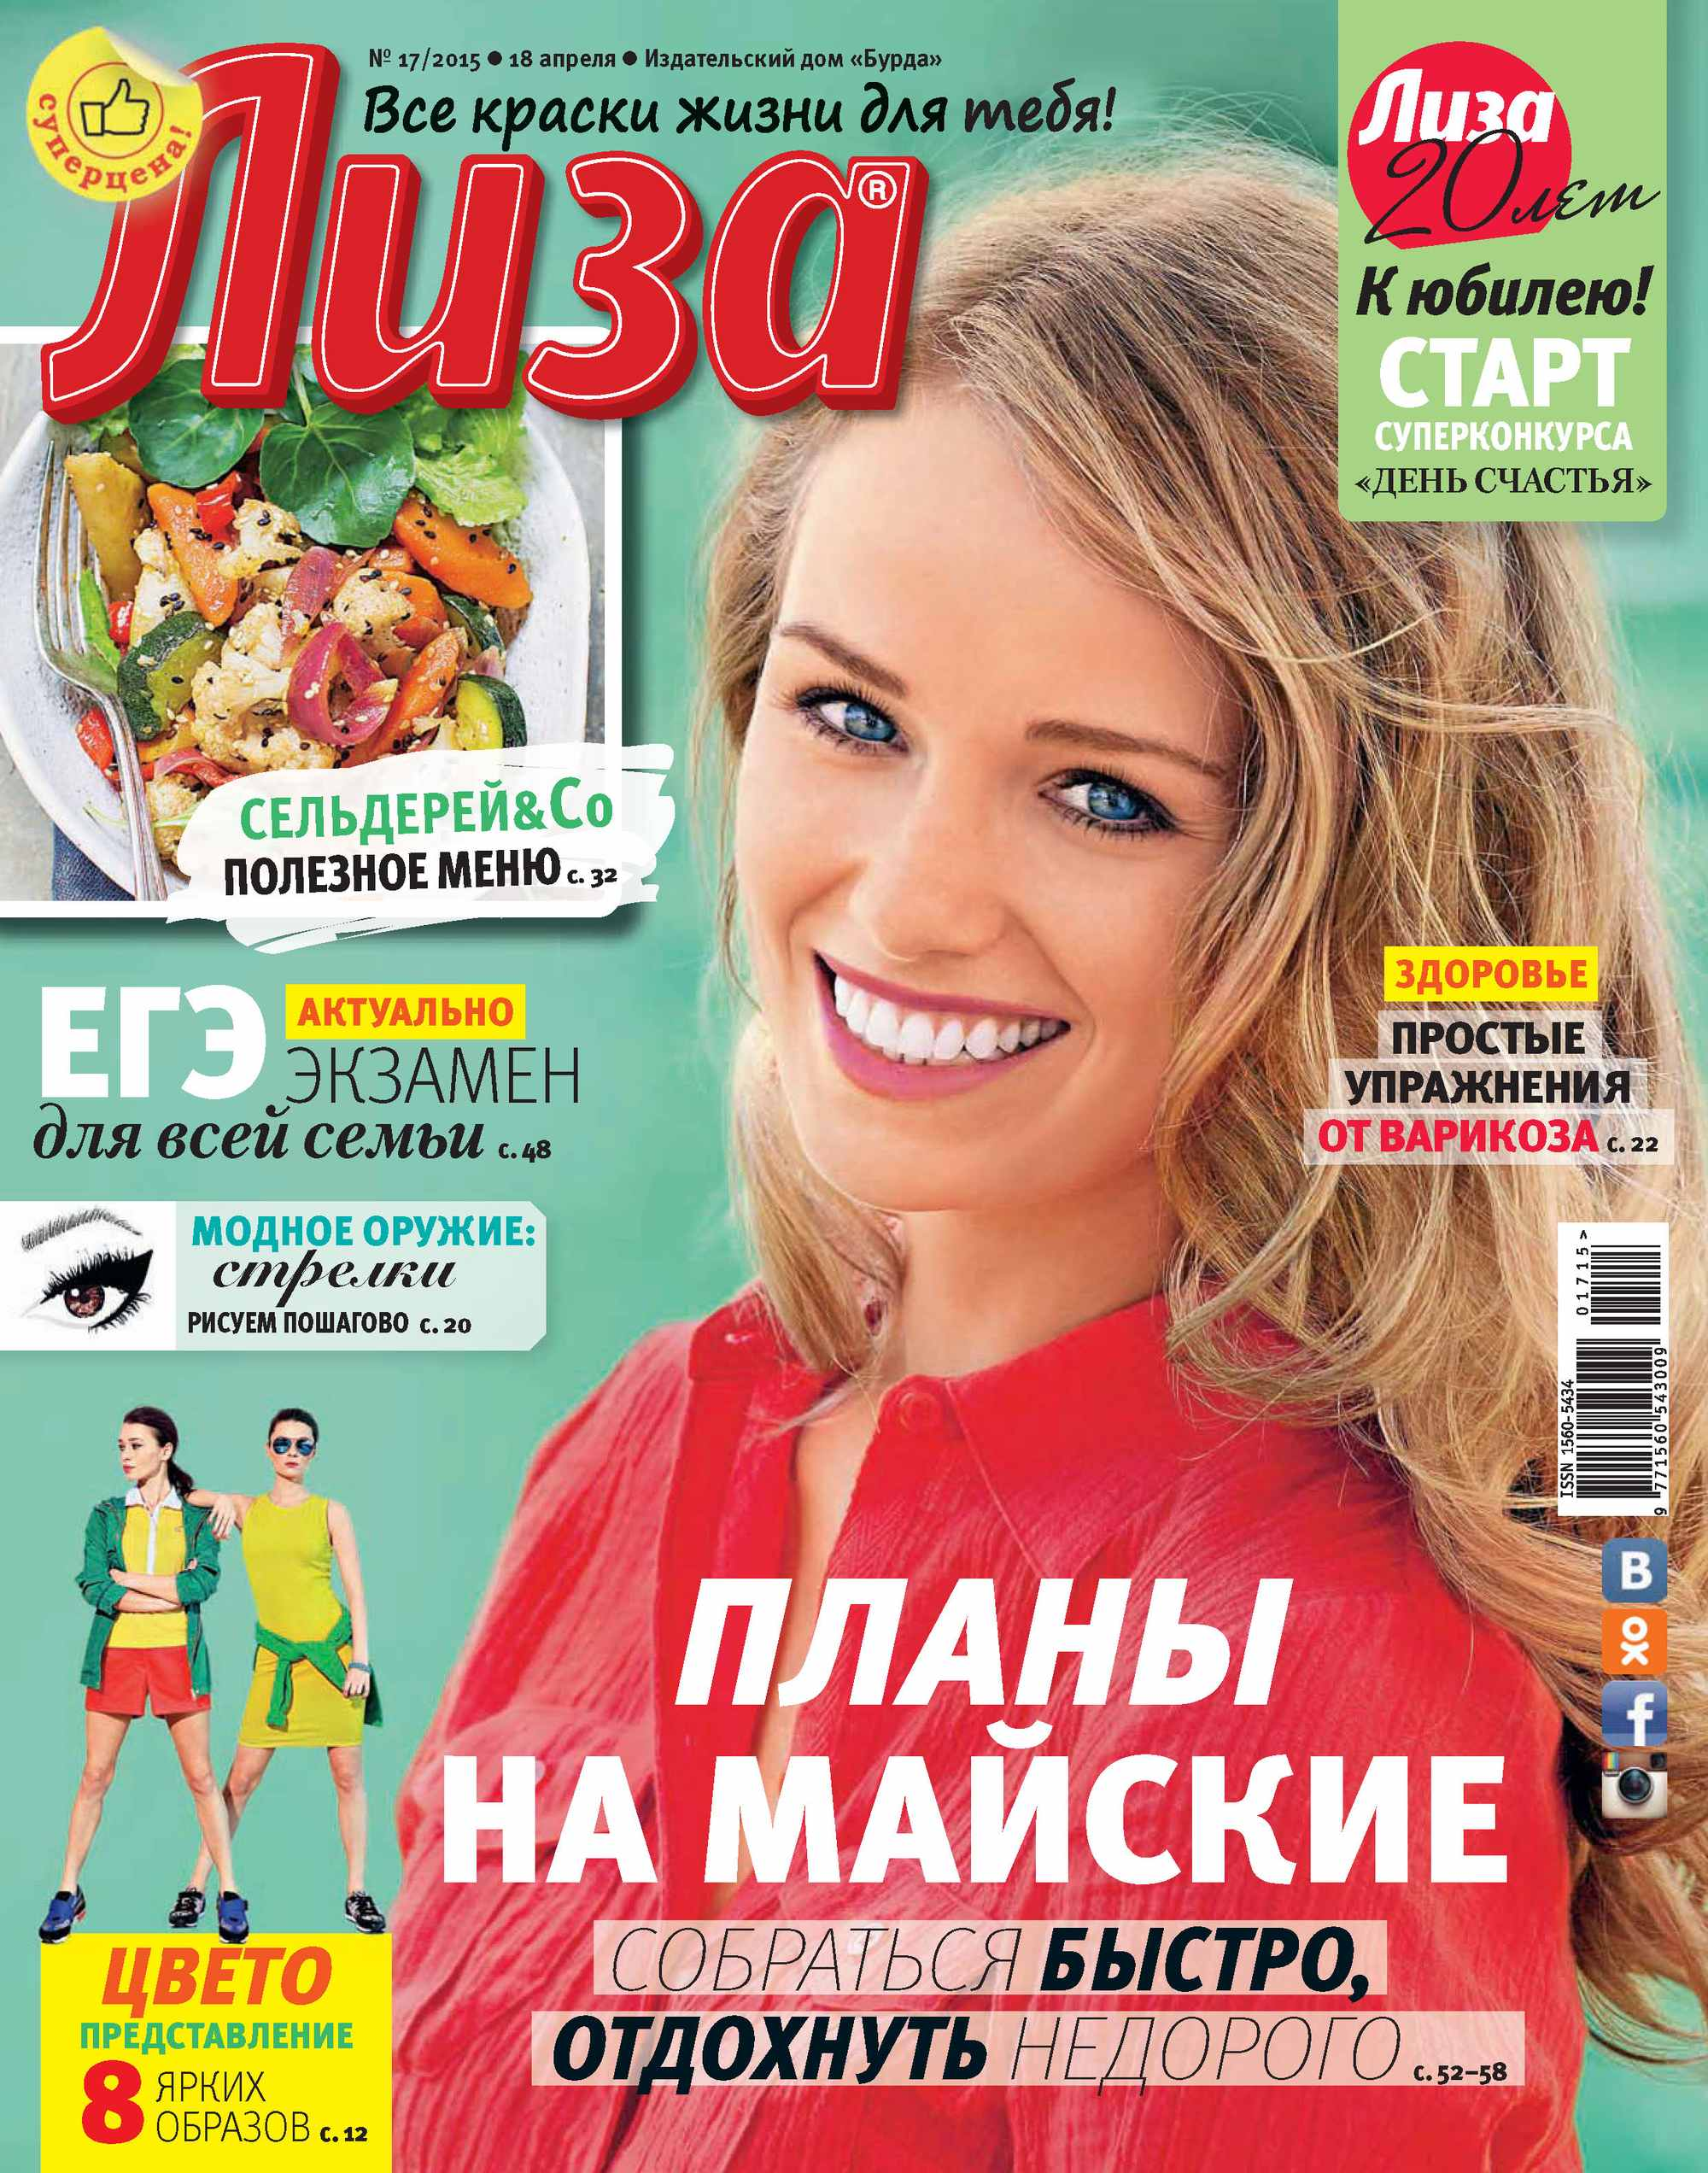 ИД «Бурда» Журнал «Лиза» №17/2015 ид бурда журнал лиза 47 2015